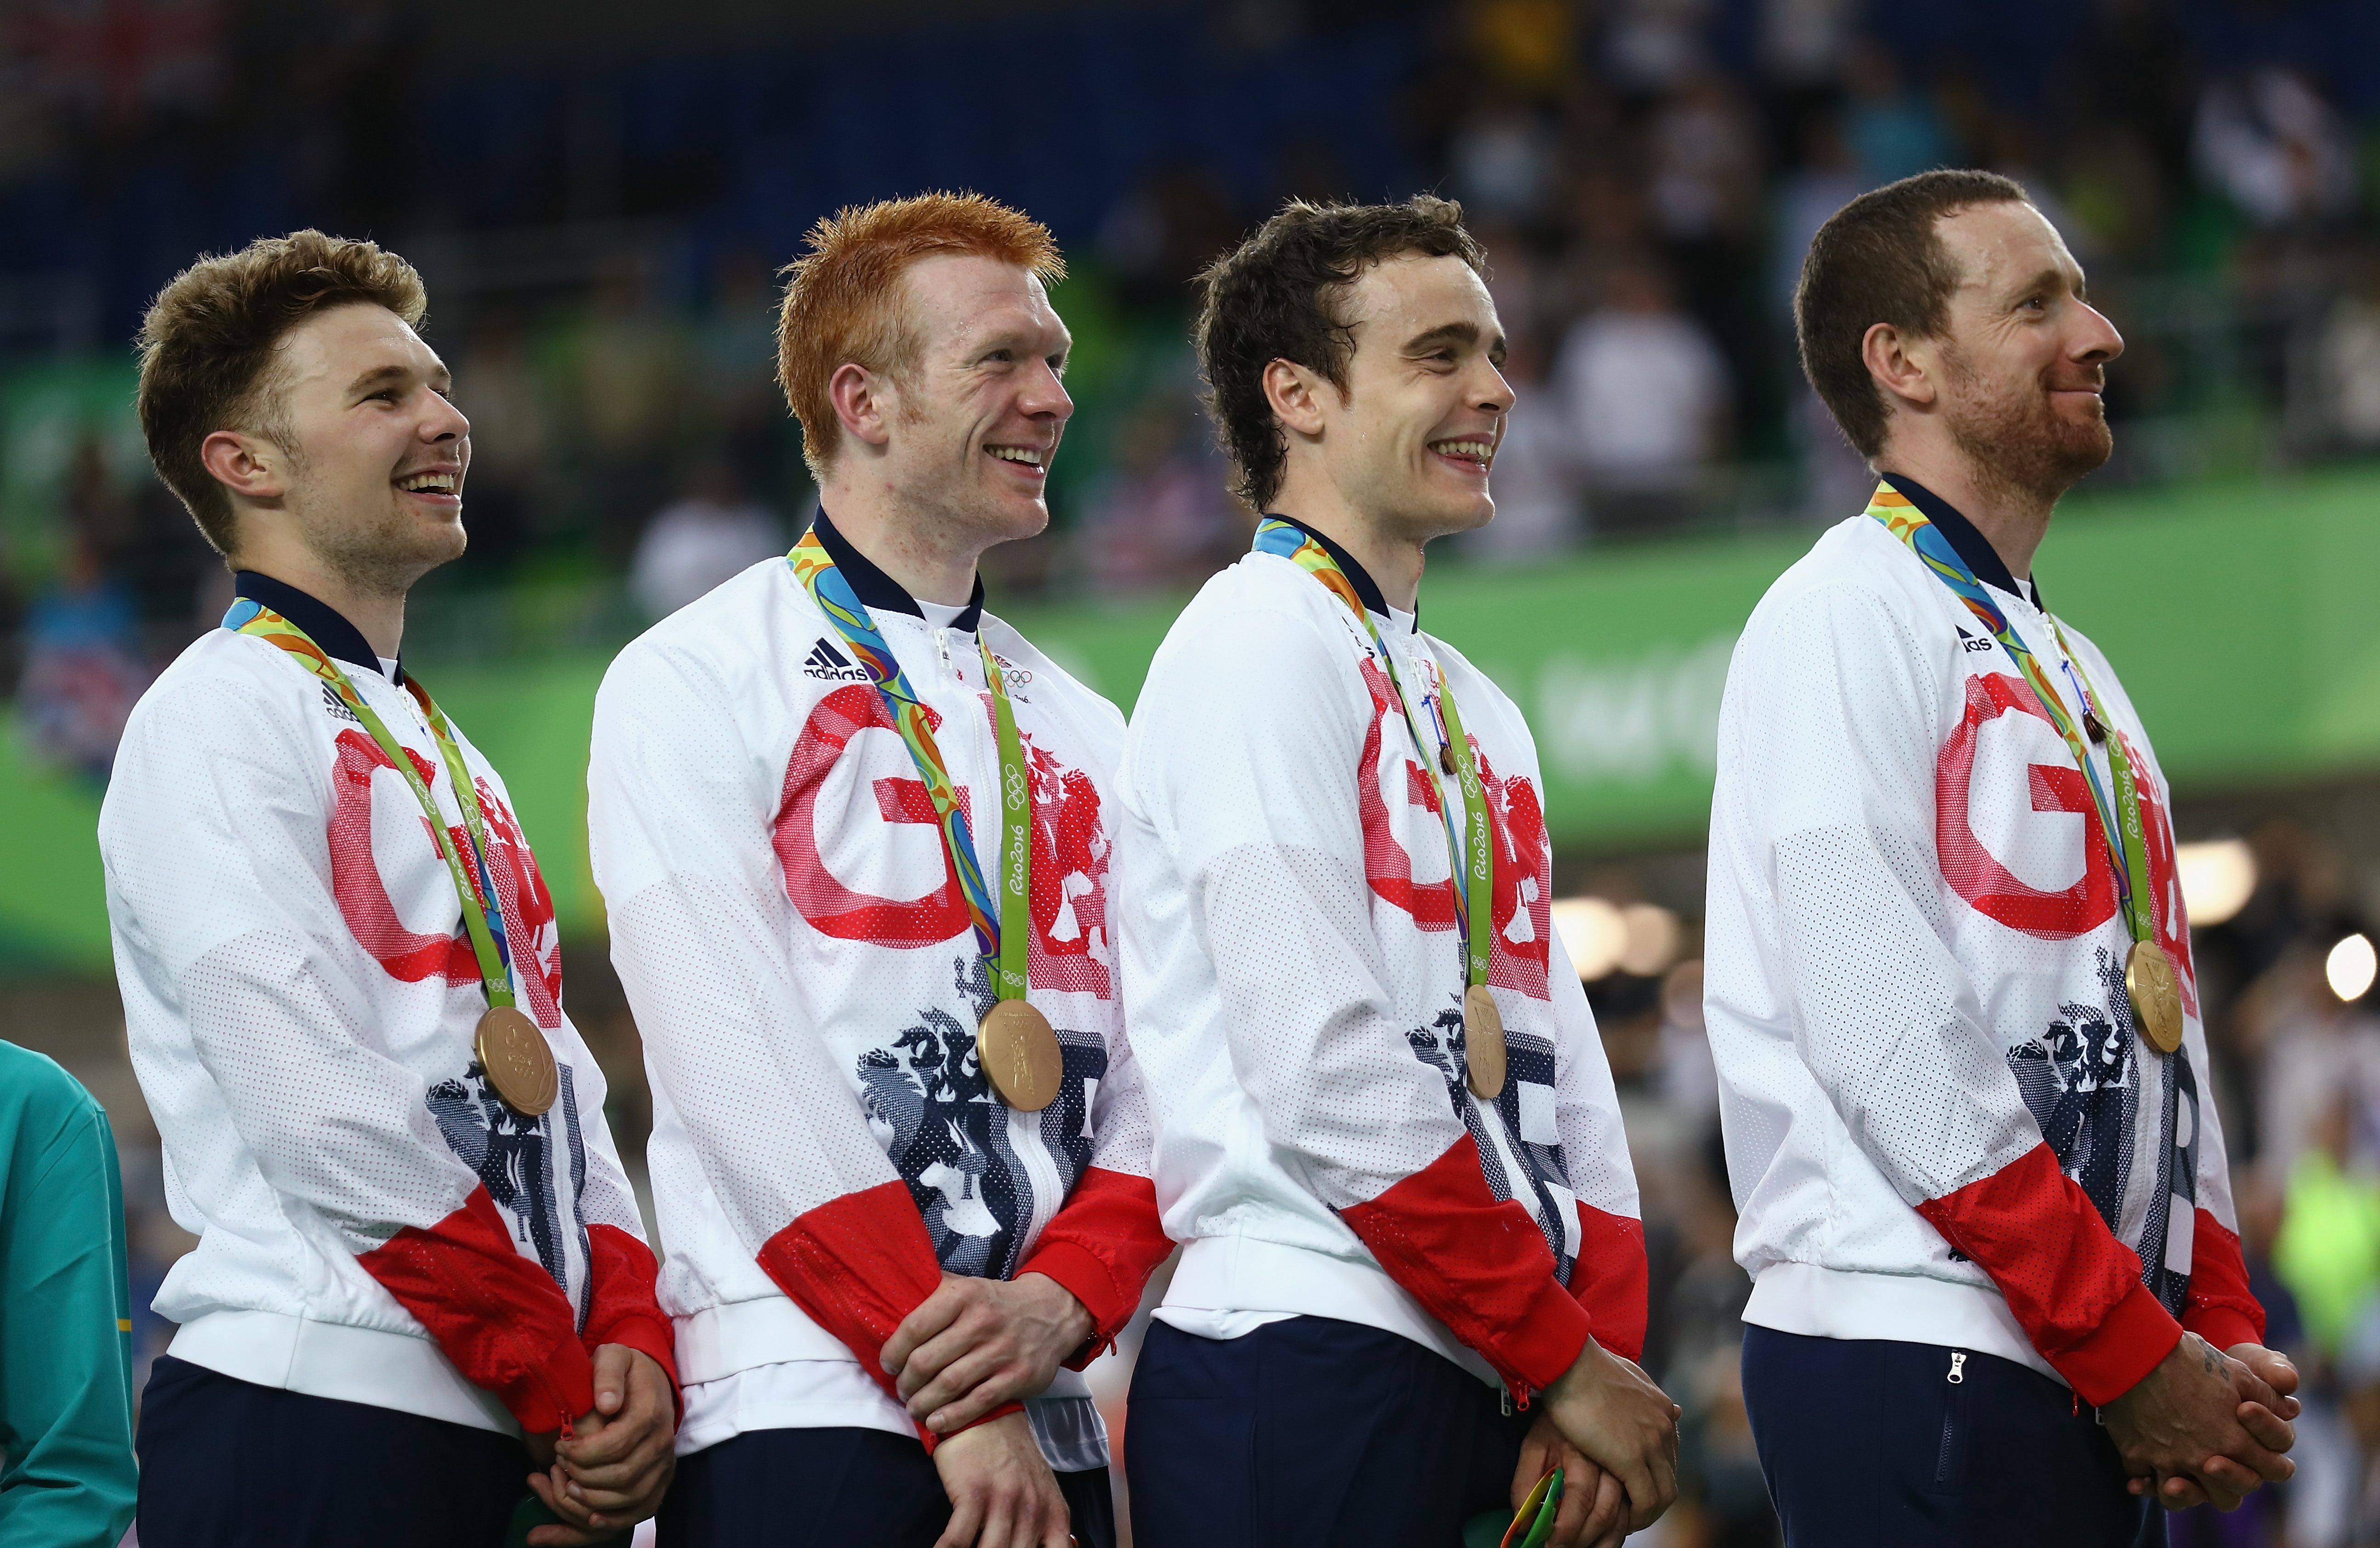 Gold Medalists Owain Doull Edward Clancy Steven Burke And Bradley Wiggins Bryn Lennon Getty Images